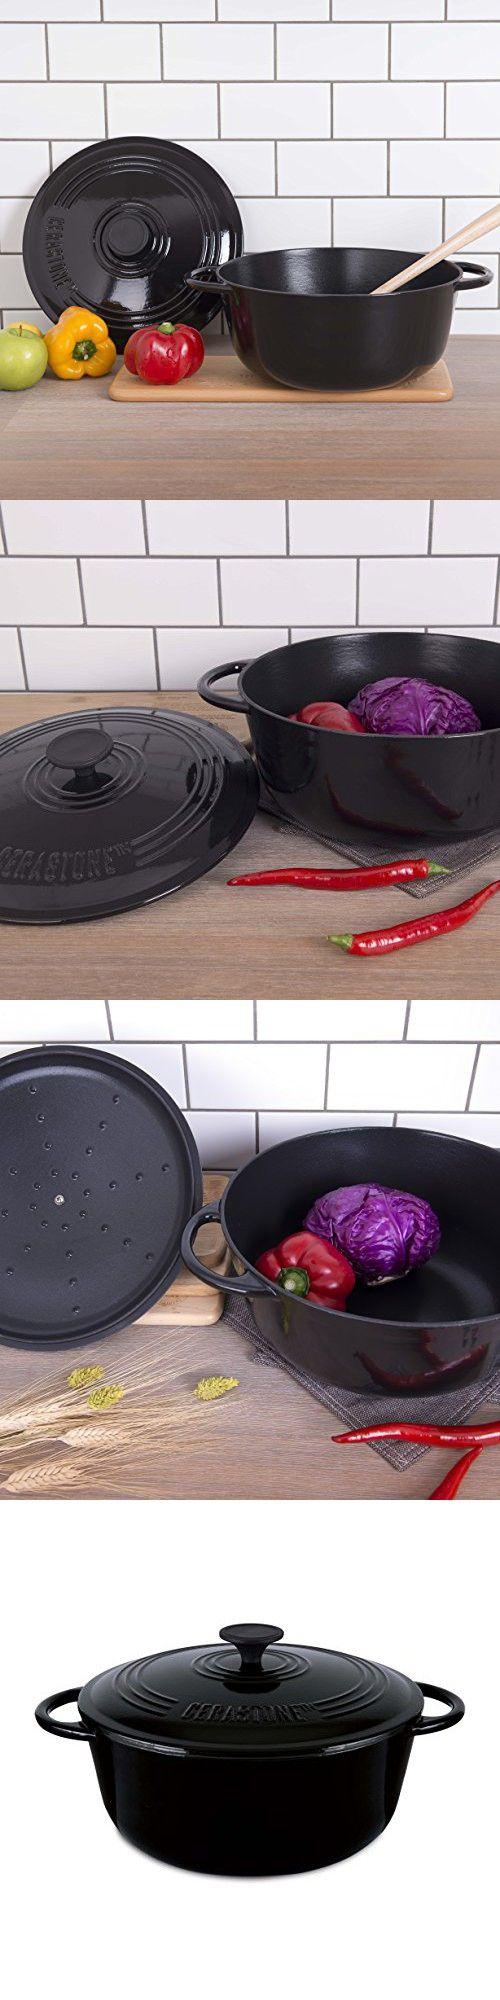 CeraStone Cast Iron CCI0116 Ceramic Coating Interior And Color Enamel Coating Exterior Dutch Oven Cookware, Black